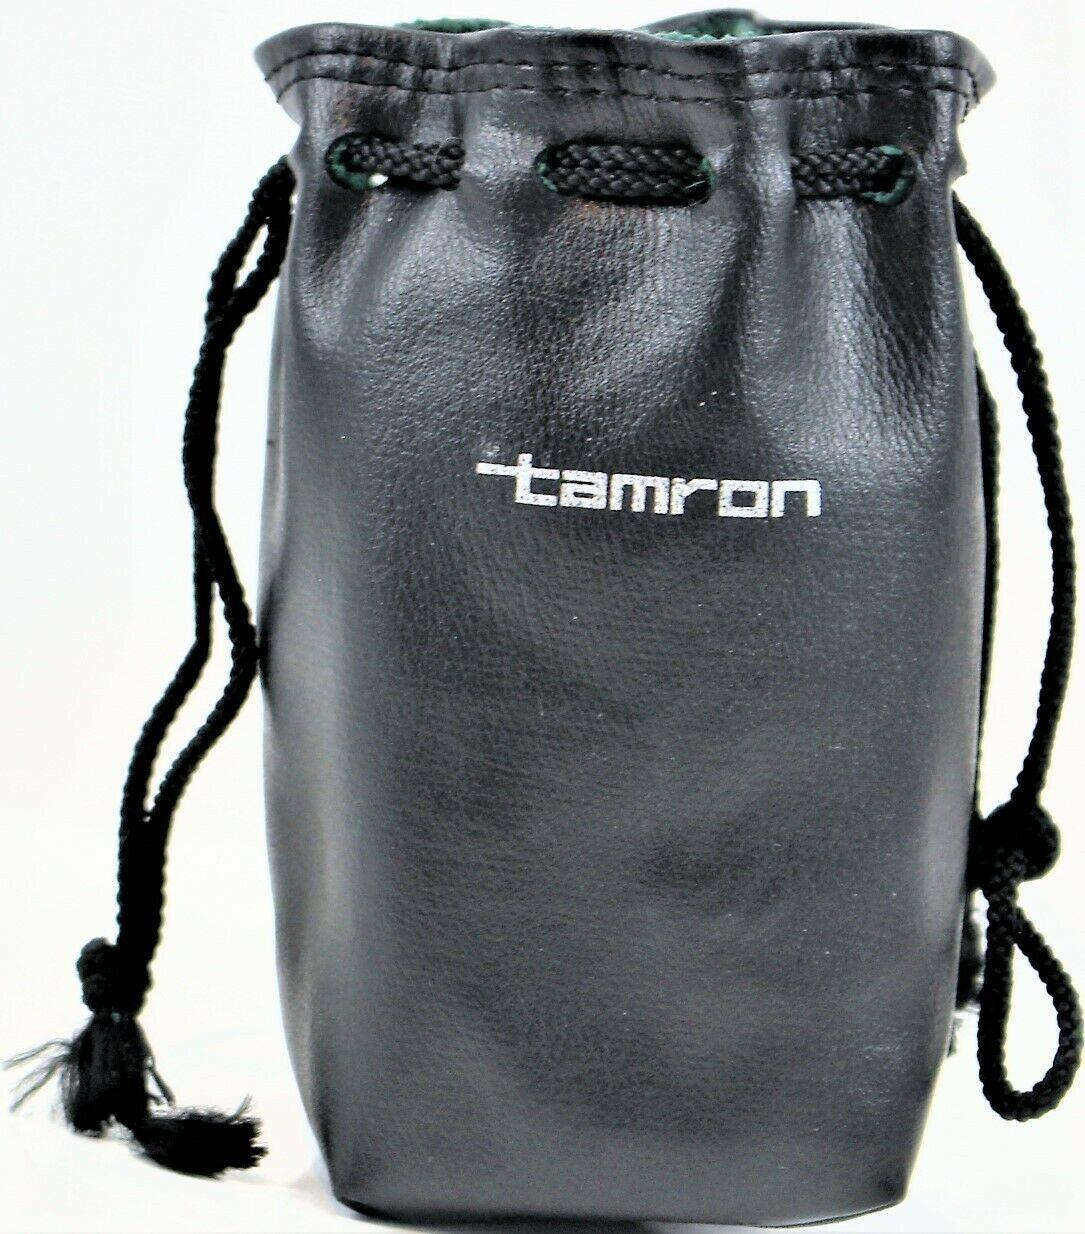 Tamron Multi C F 1:2.8 135mm Camera Lens for Nikon AI With Soft Case image 9